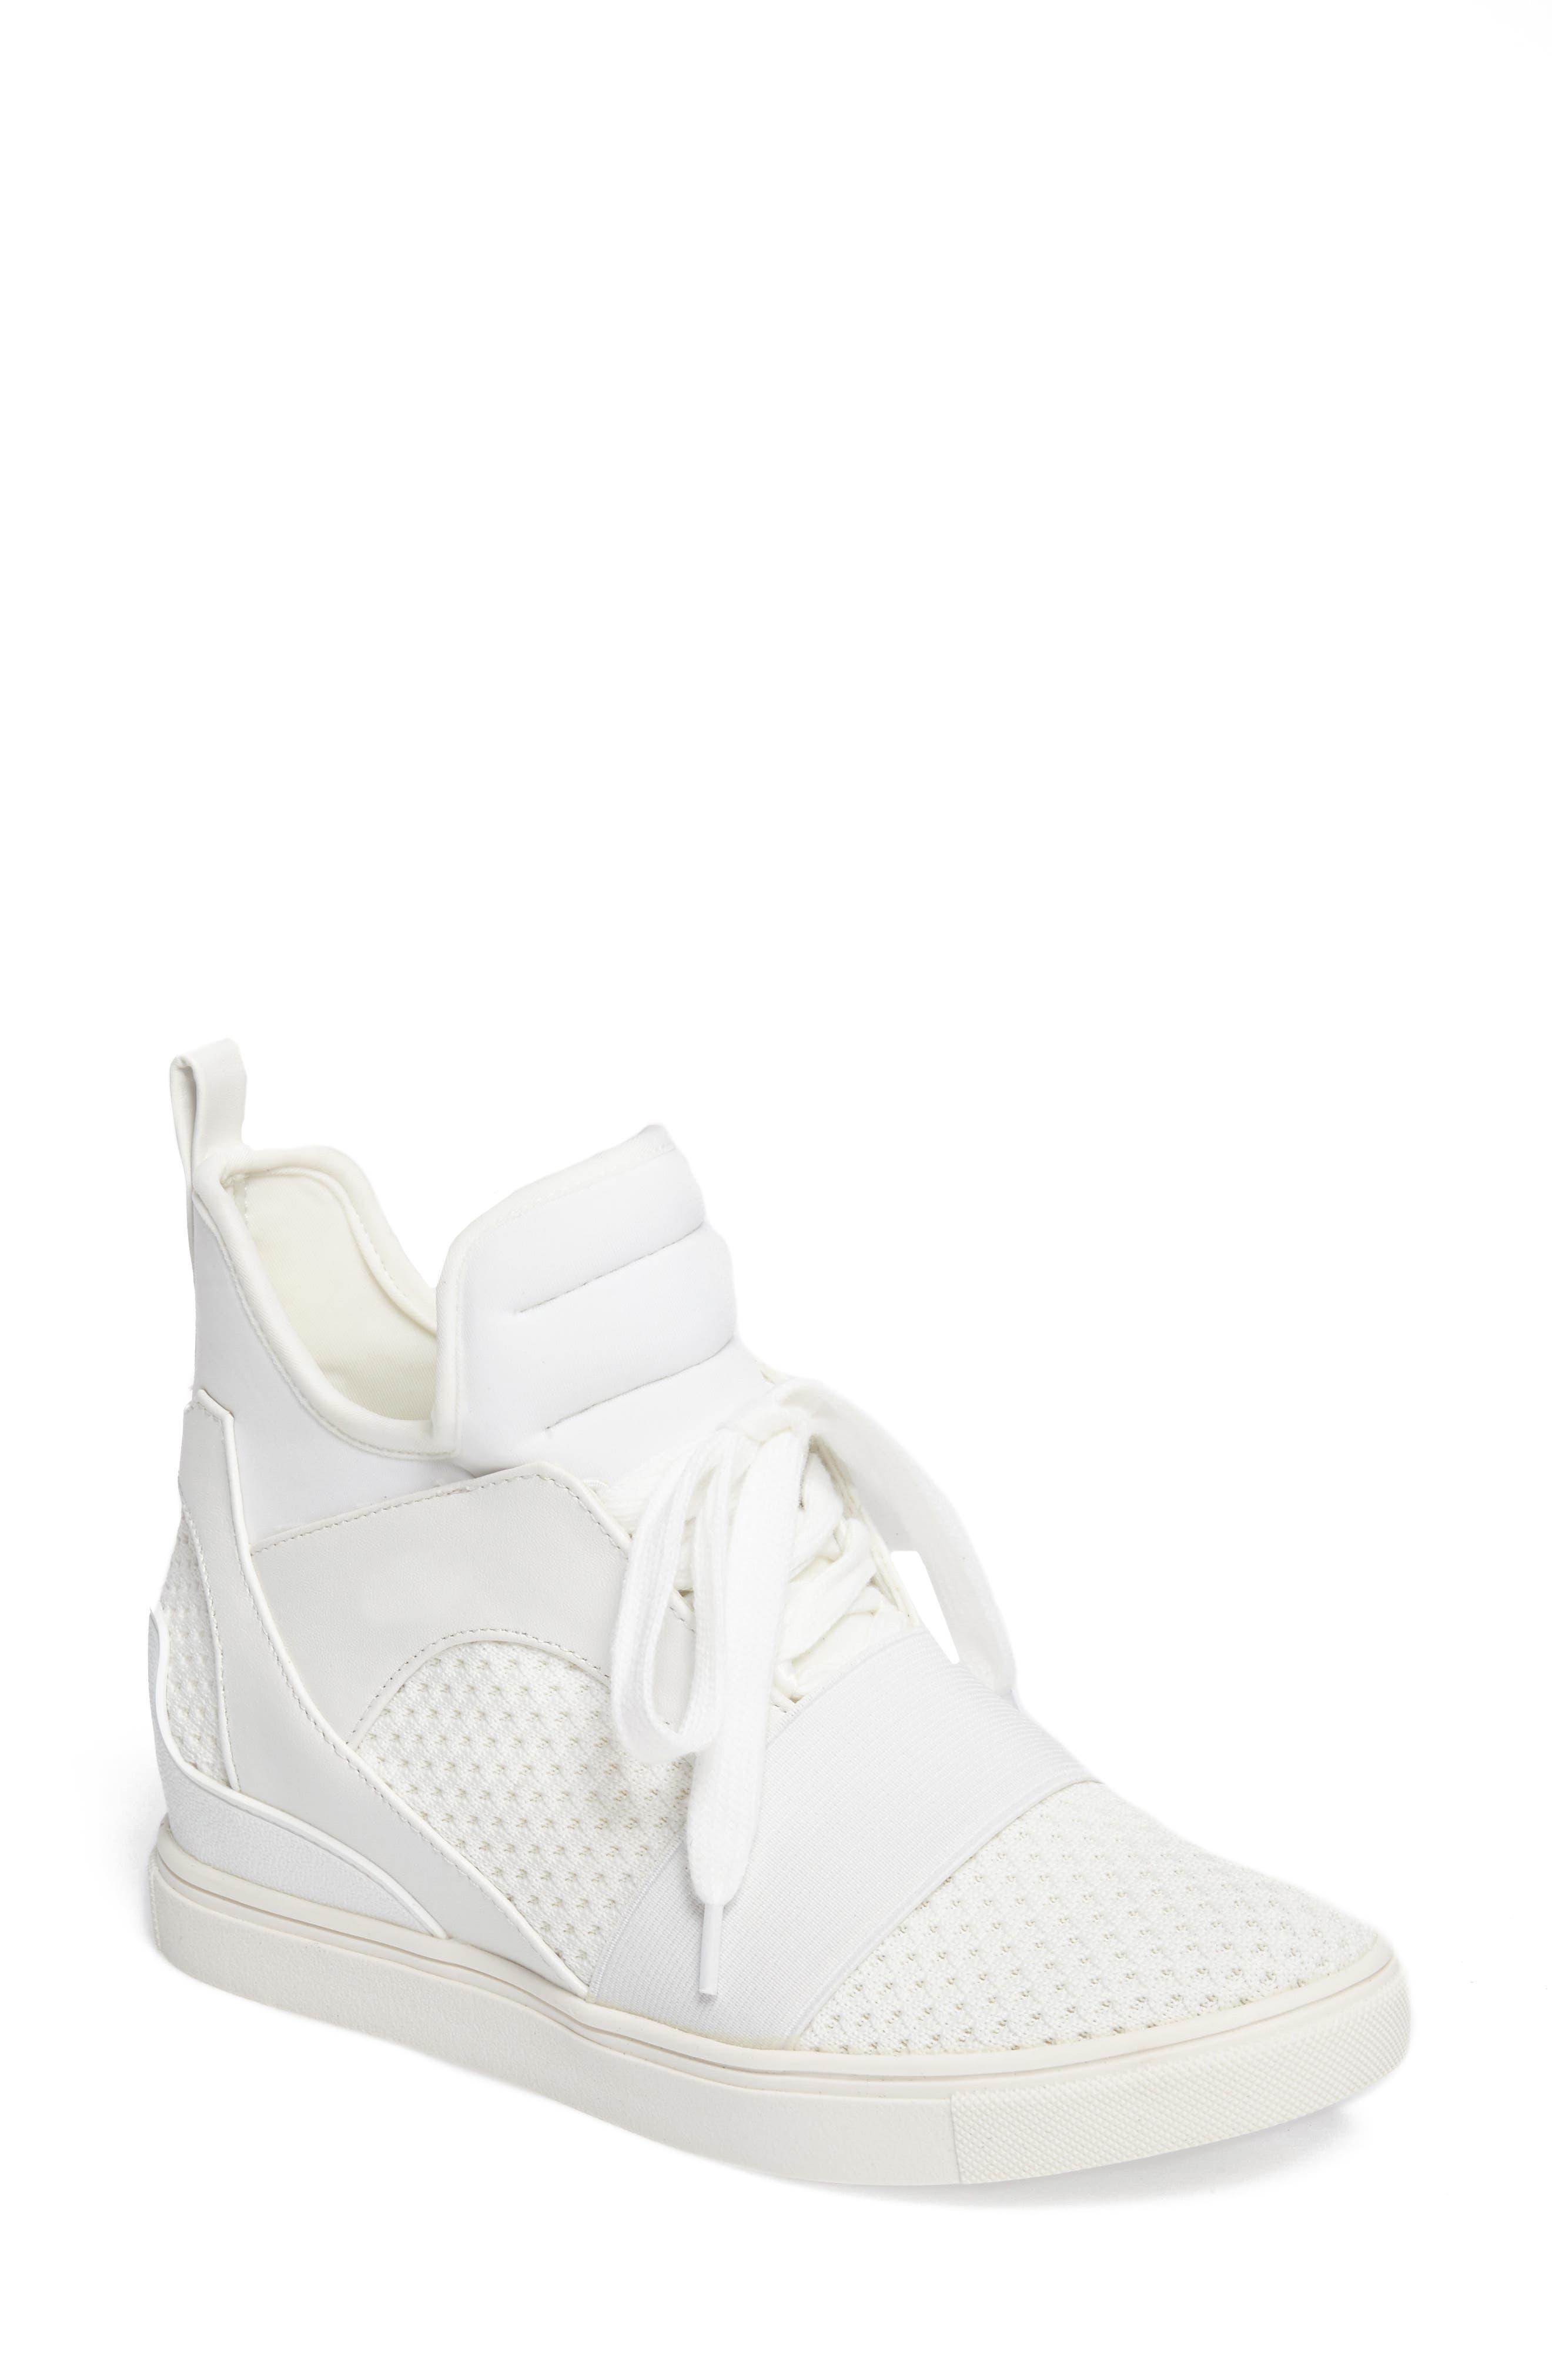 Lexie Wedge Sneaker,                             Main thumbnail 1, color,                             White